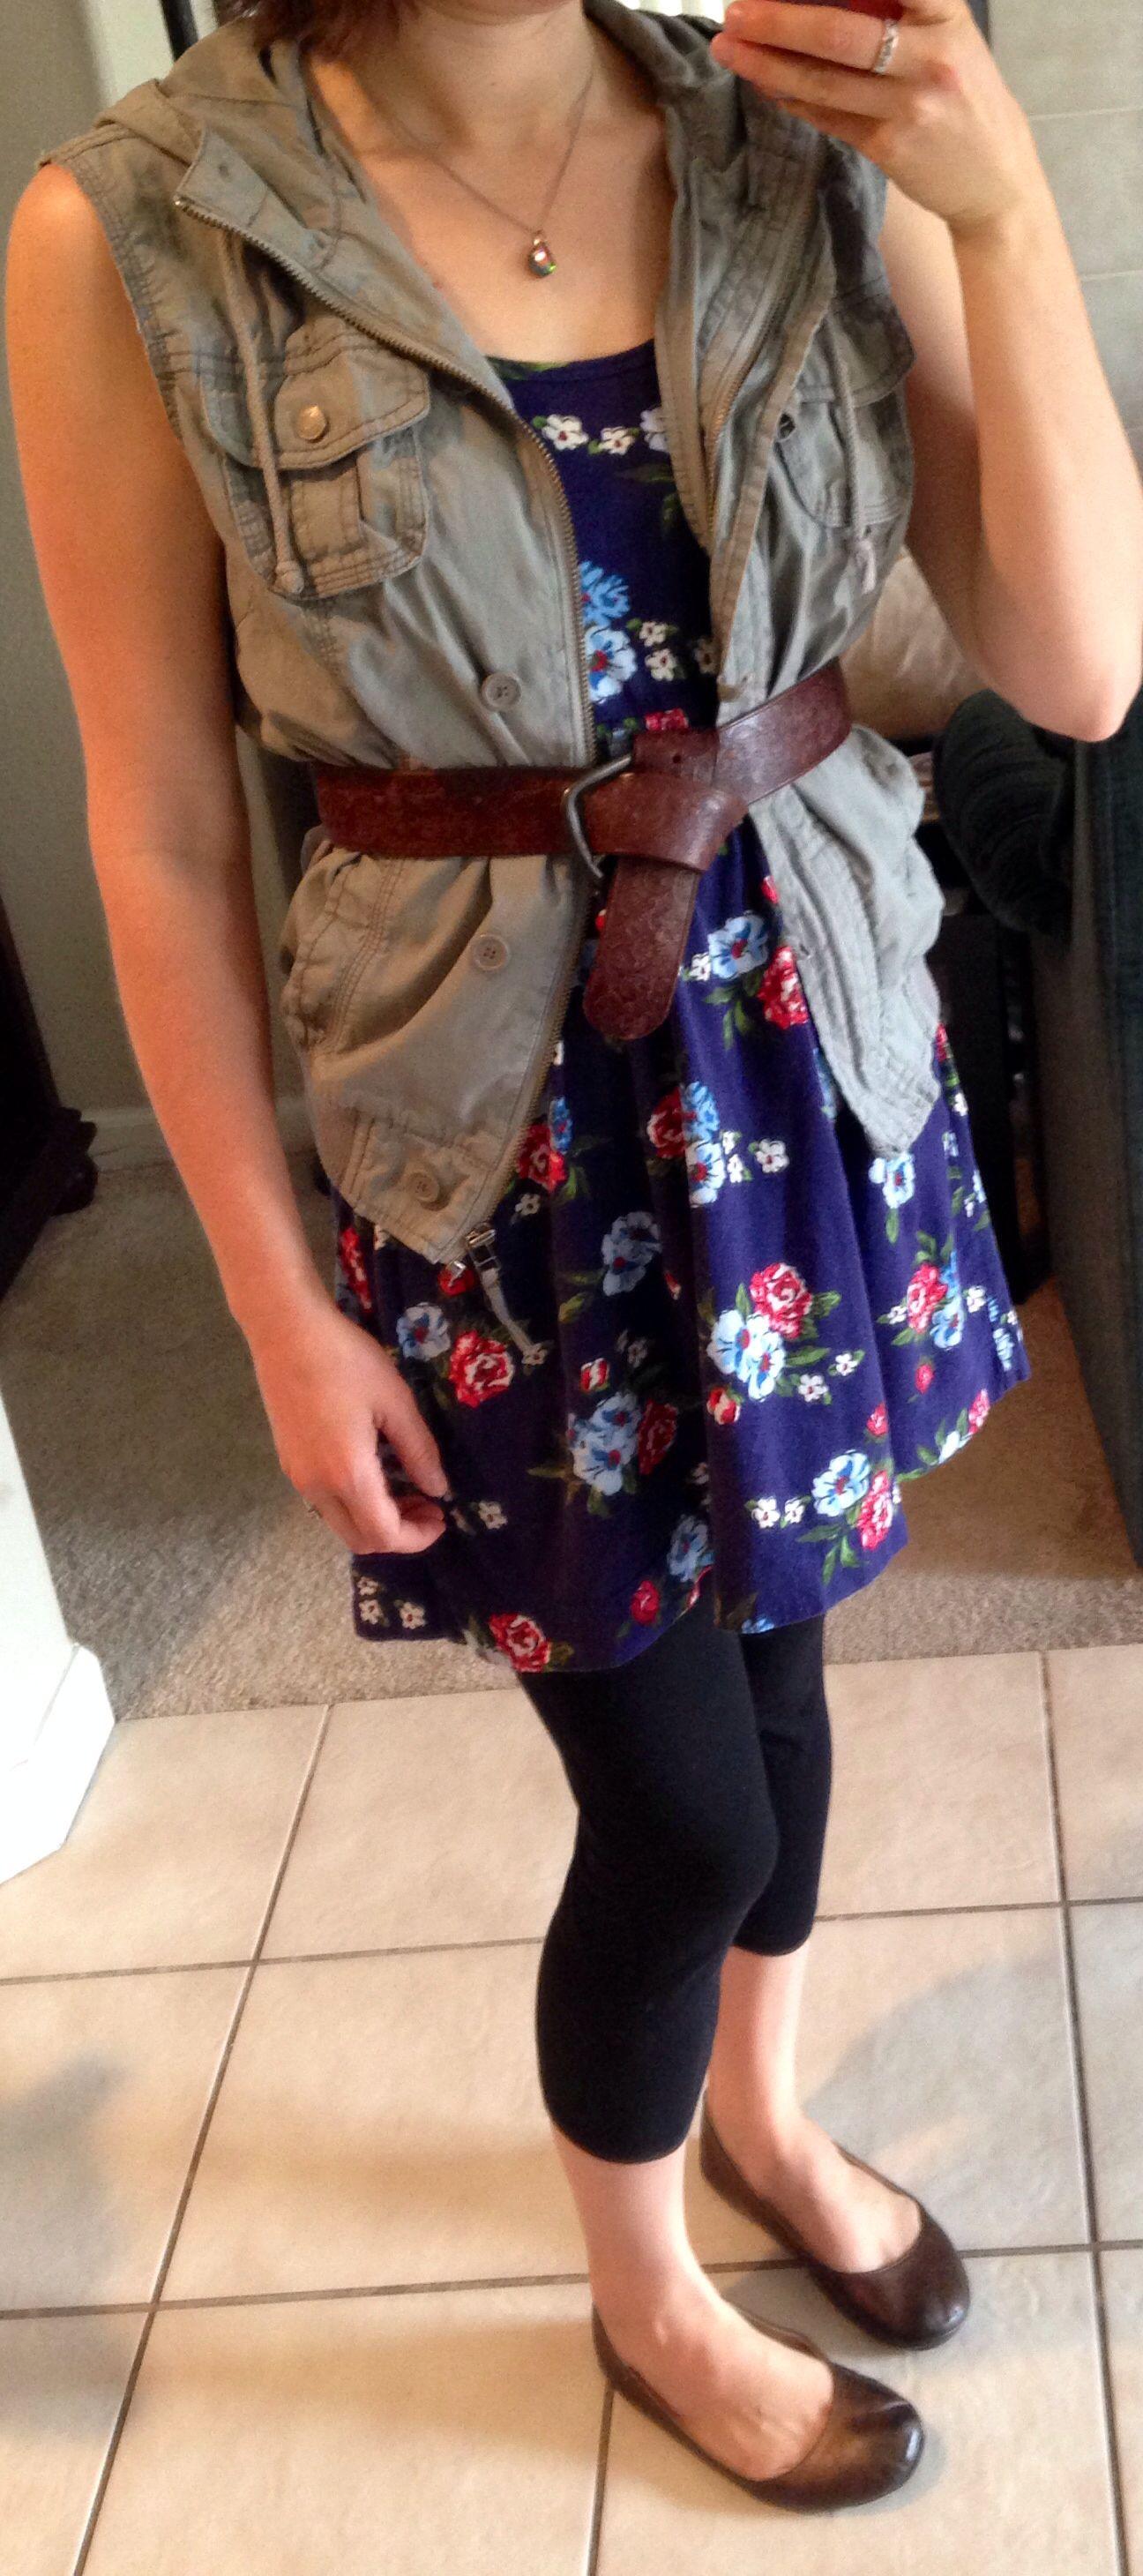 be6581394d6 Navy Floral Dress Black Tights